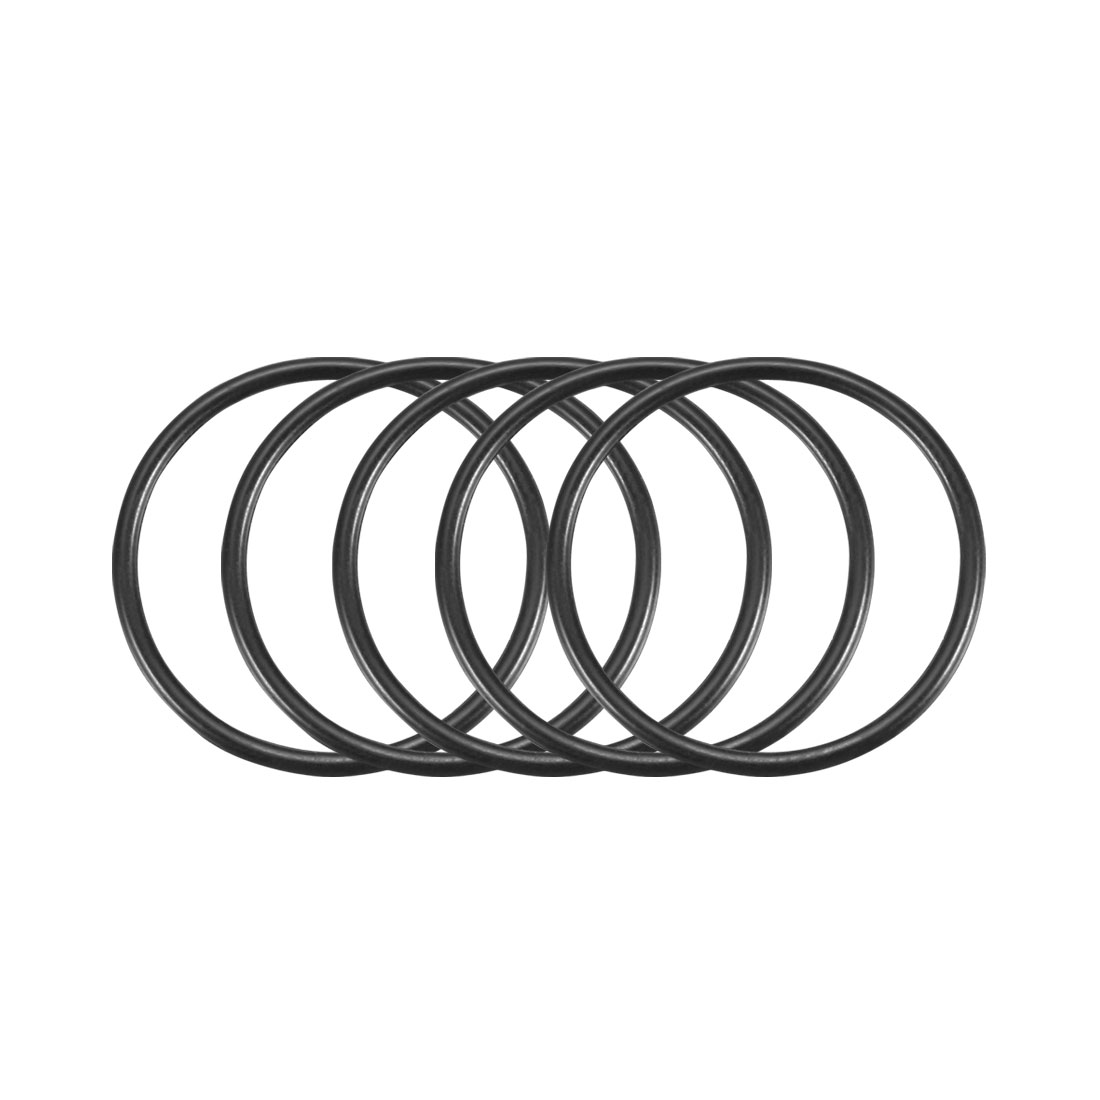 100Pcs Black 25mm x 1.5mm Nitrile Rubber O Ring NBR Oil Sealing Grommets